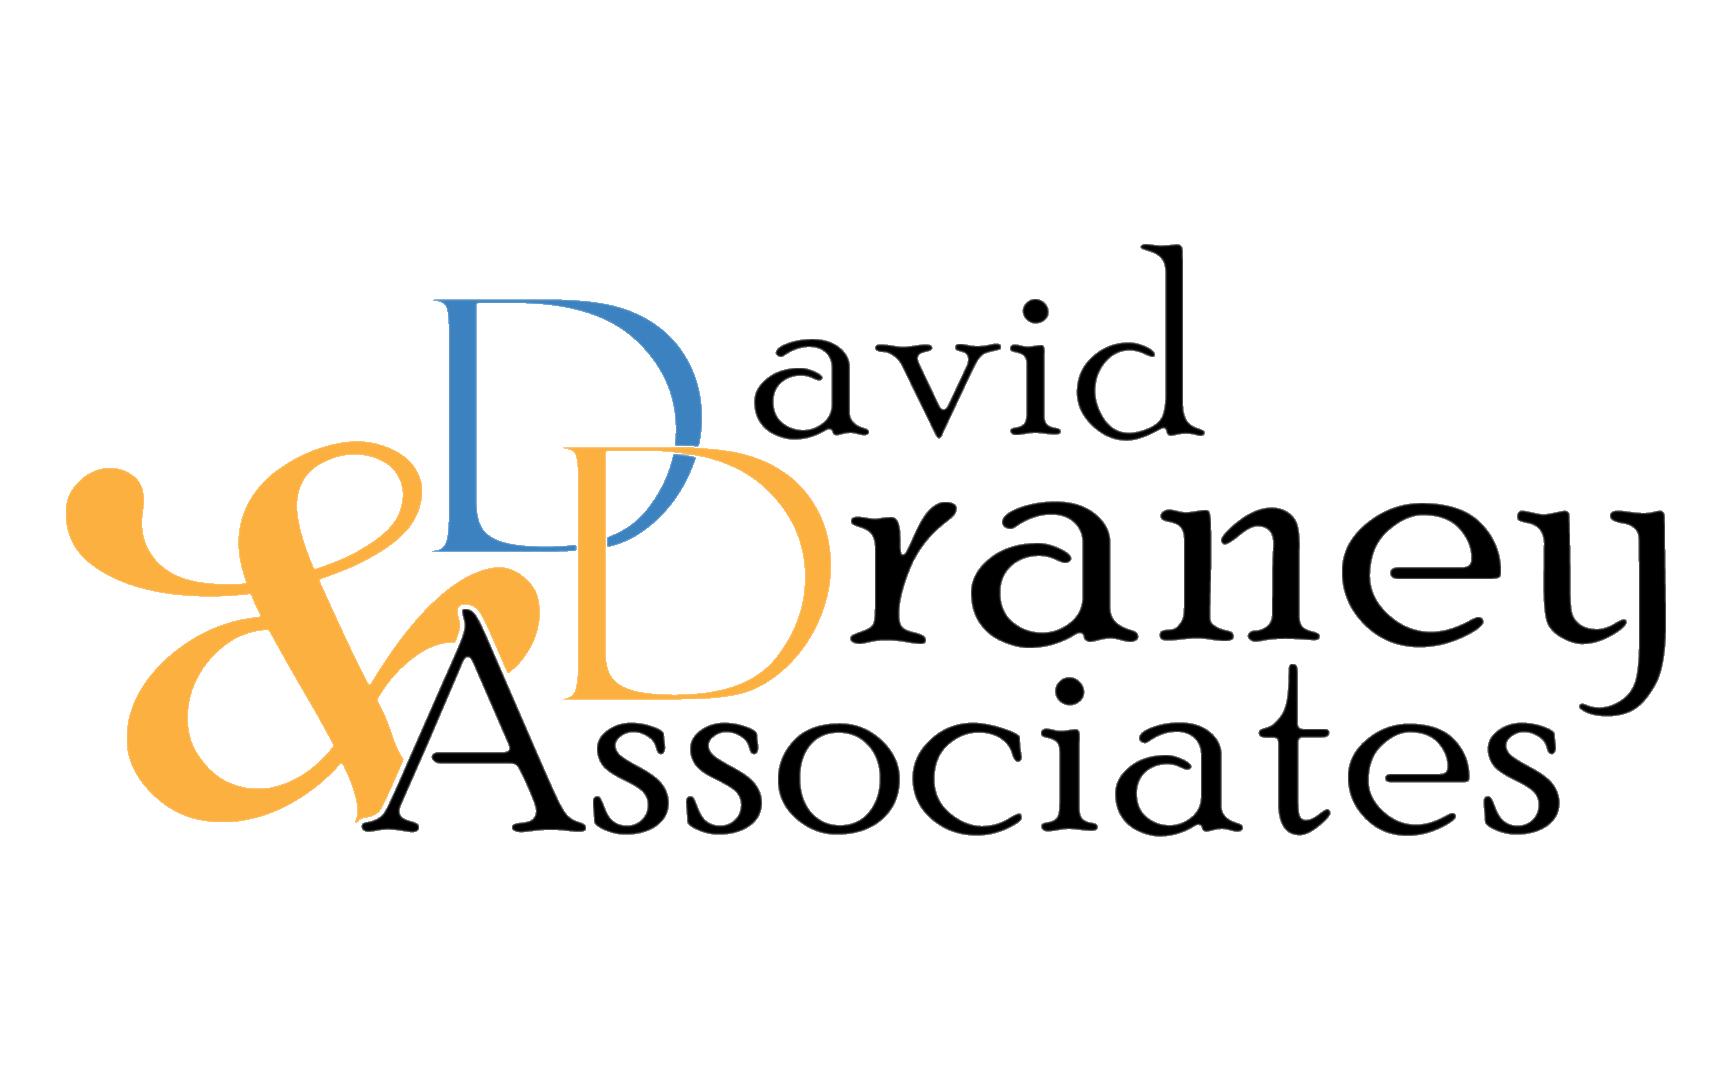 David Draney & Associates